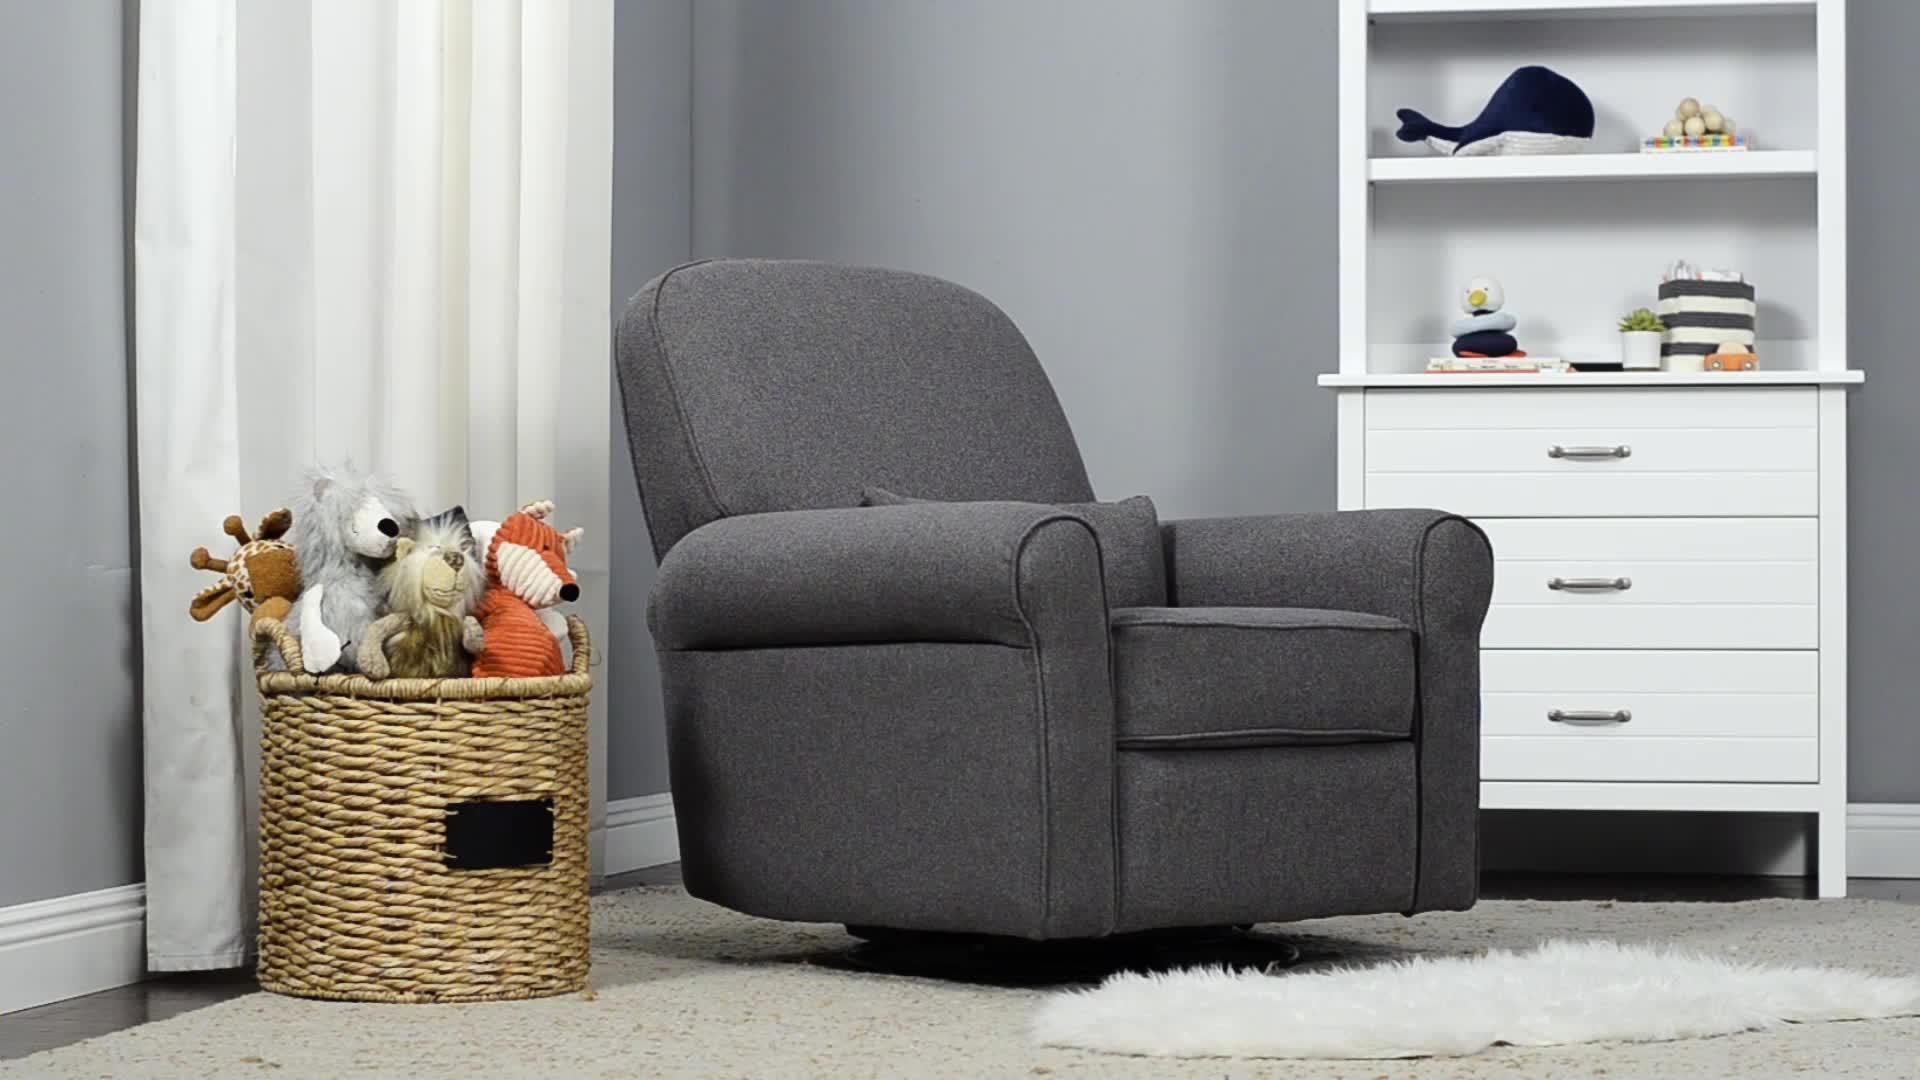 signature manual recliner furniture reviews pdx design ashley by evansville glider swivel wayfair